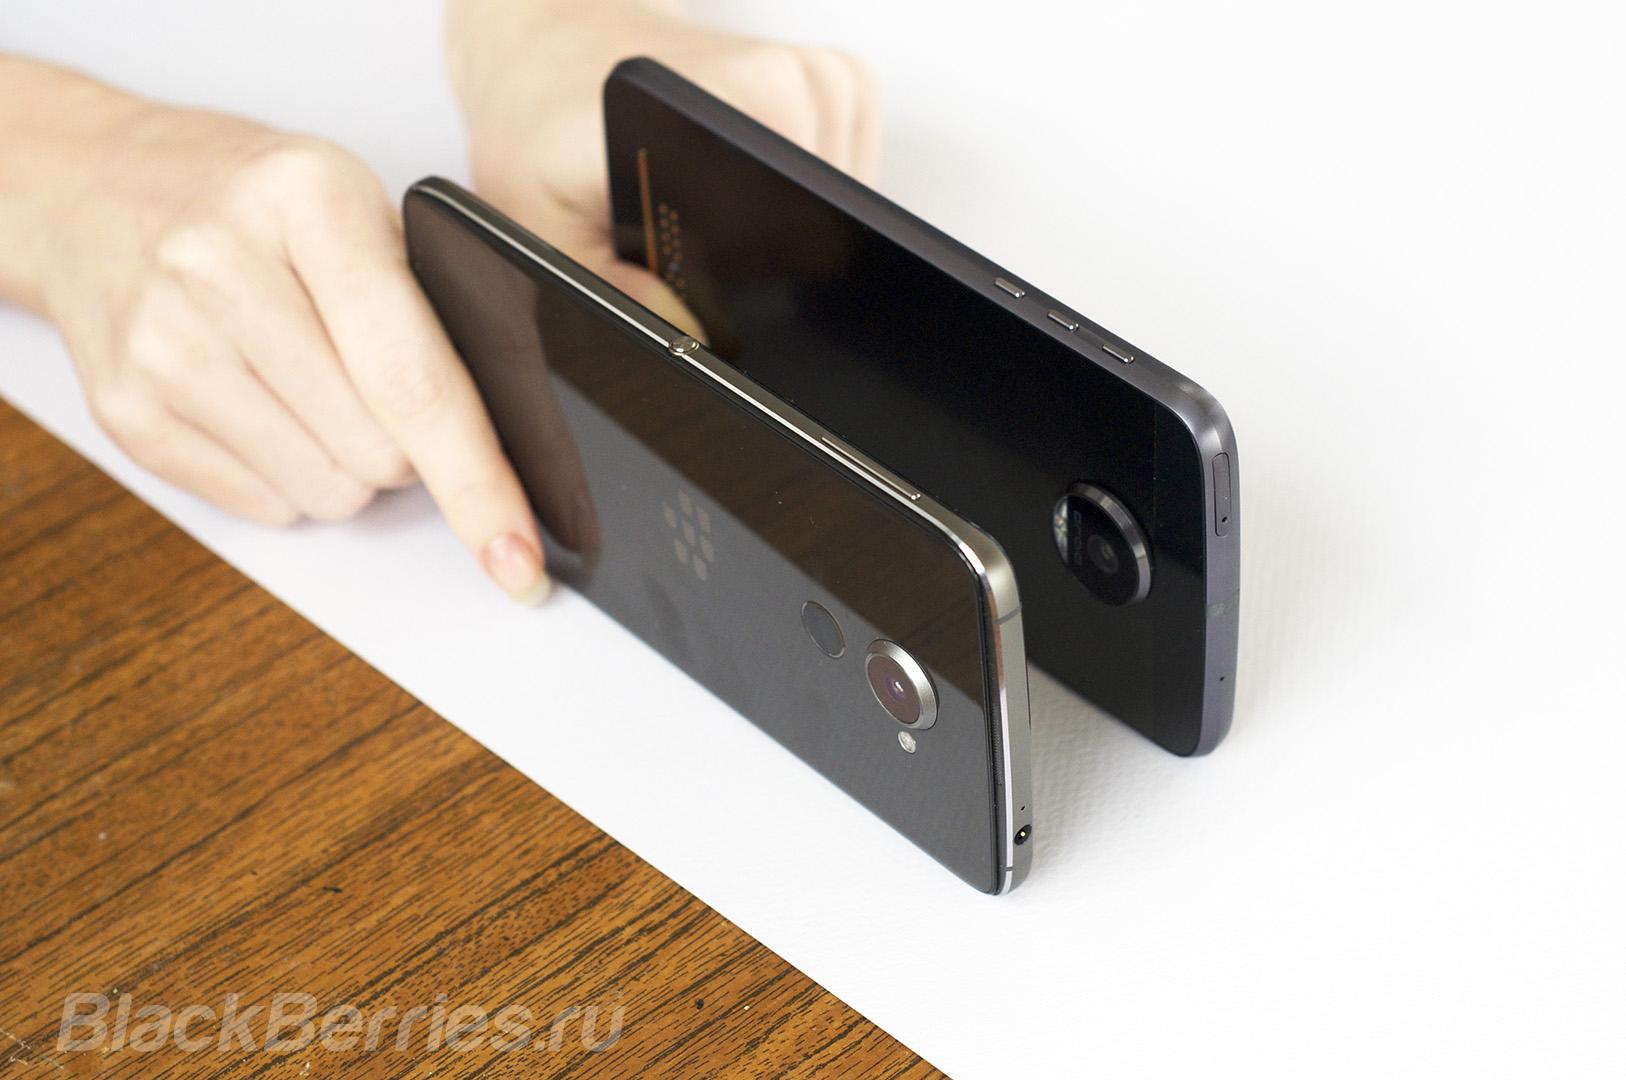 blackberry-dtek60-review-49